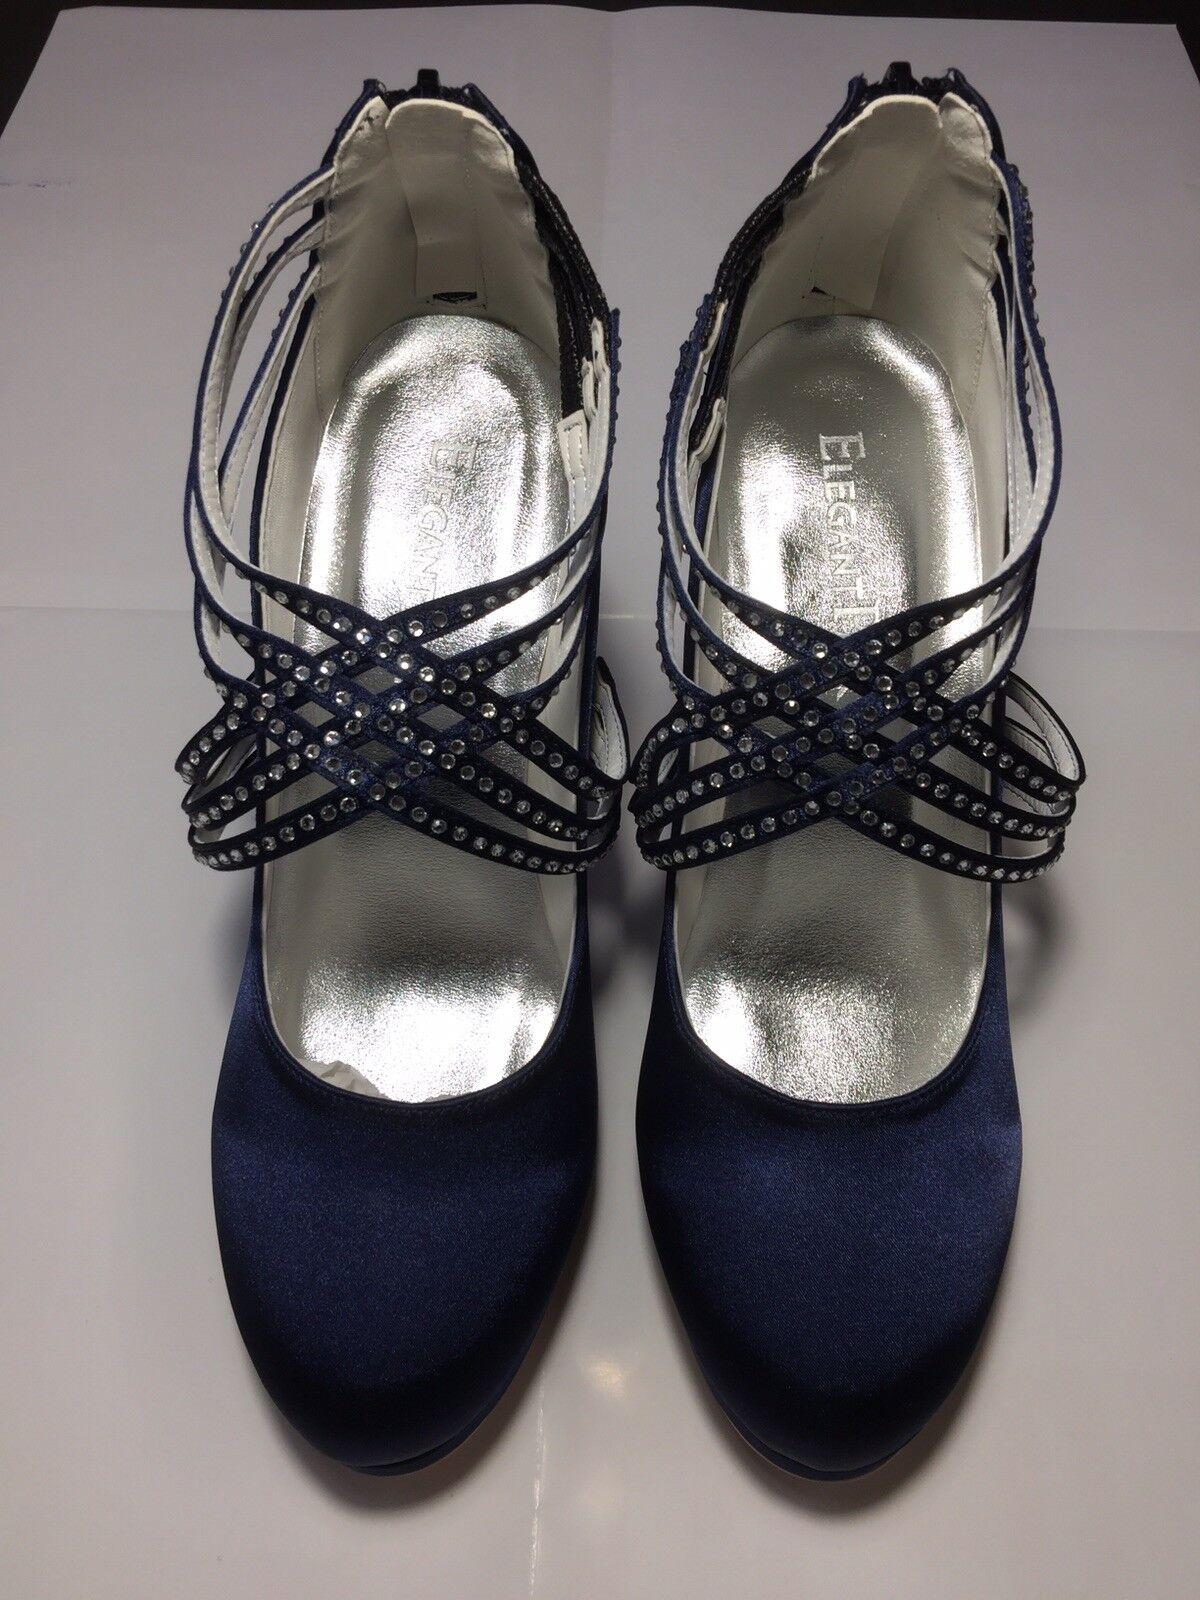 Ladies diamante sandals size 38 bluee Colour Satin Heel 4 Christmas Gift